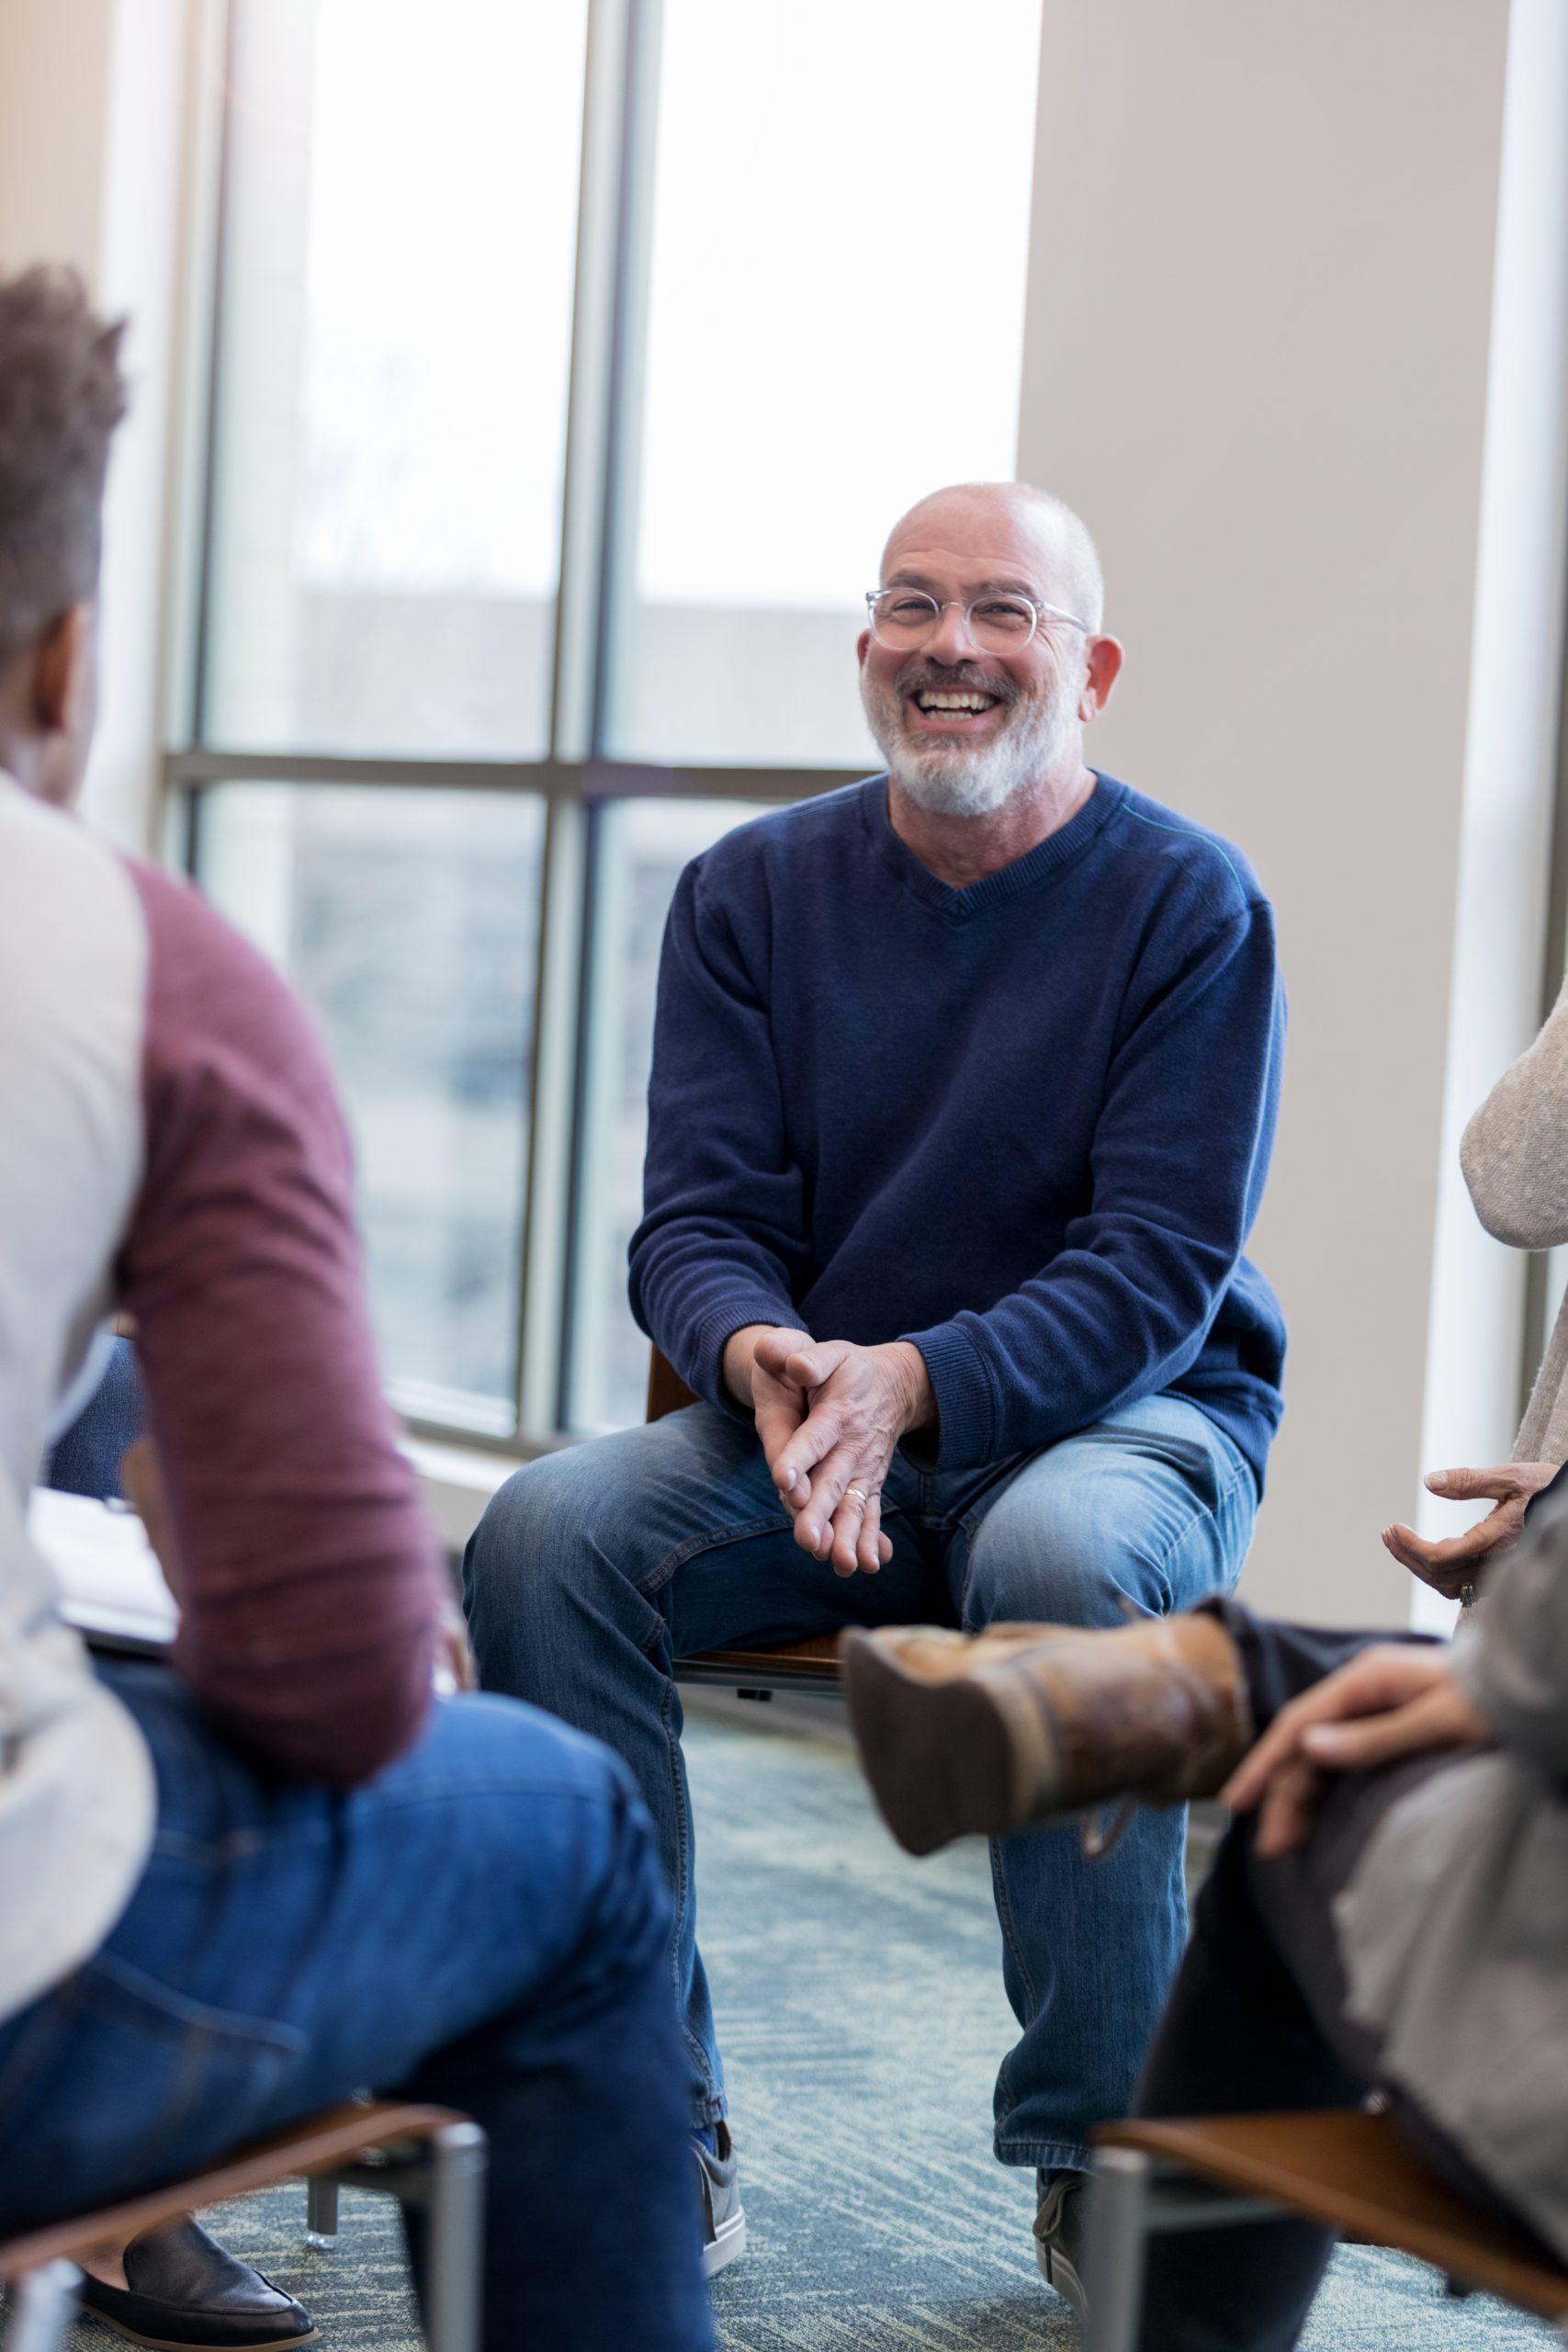 Ontario Residential Inpatient Rehab Programs